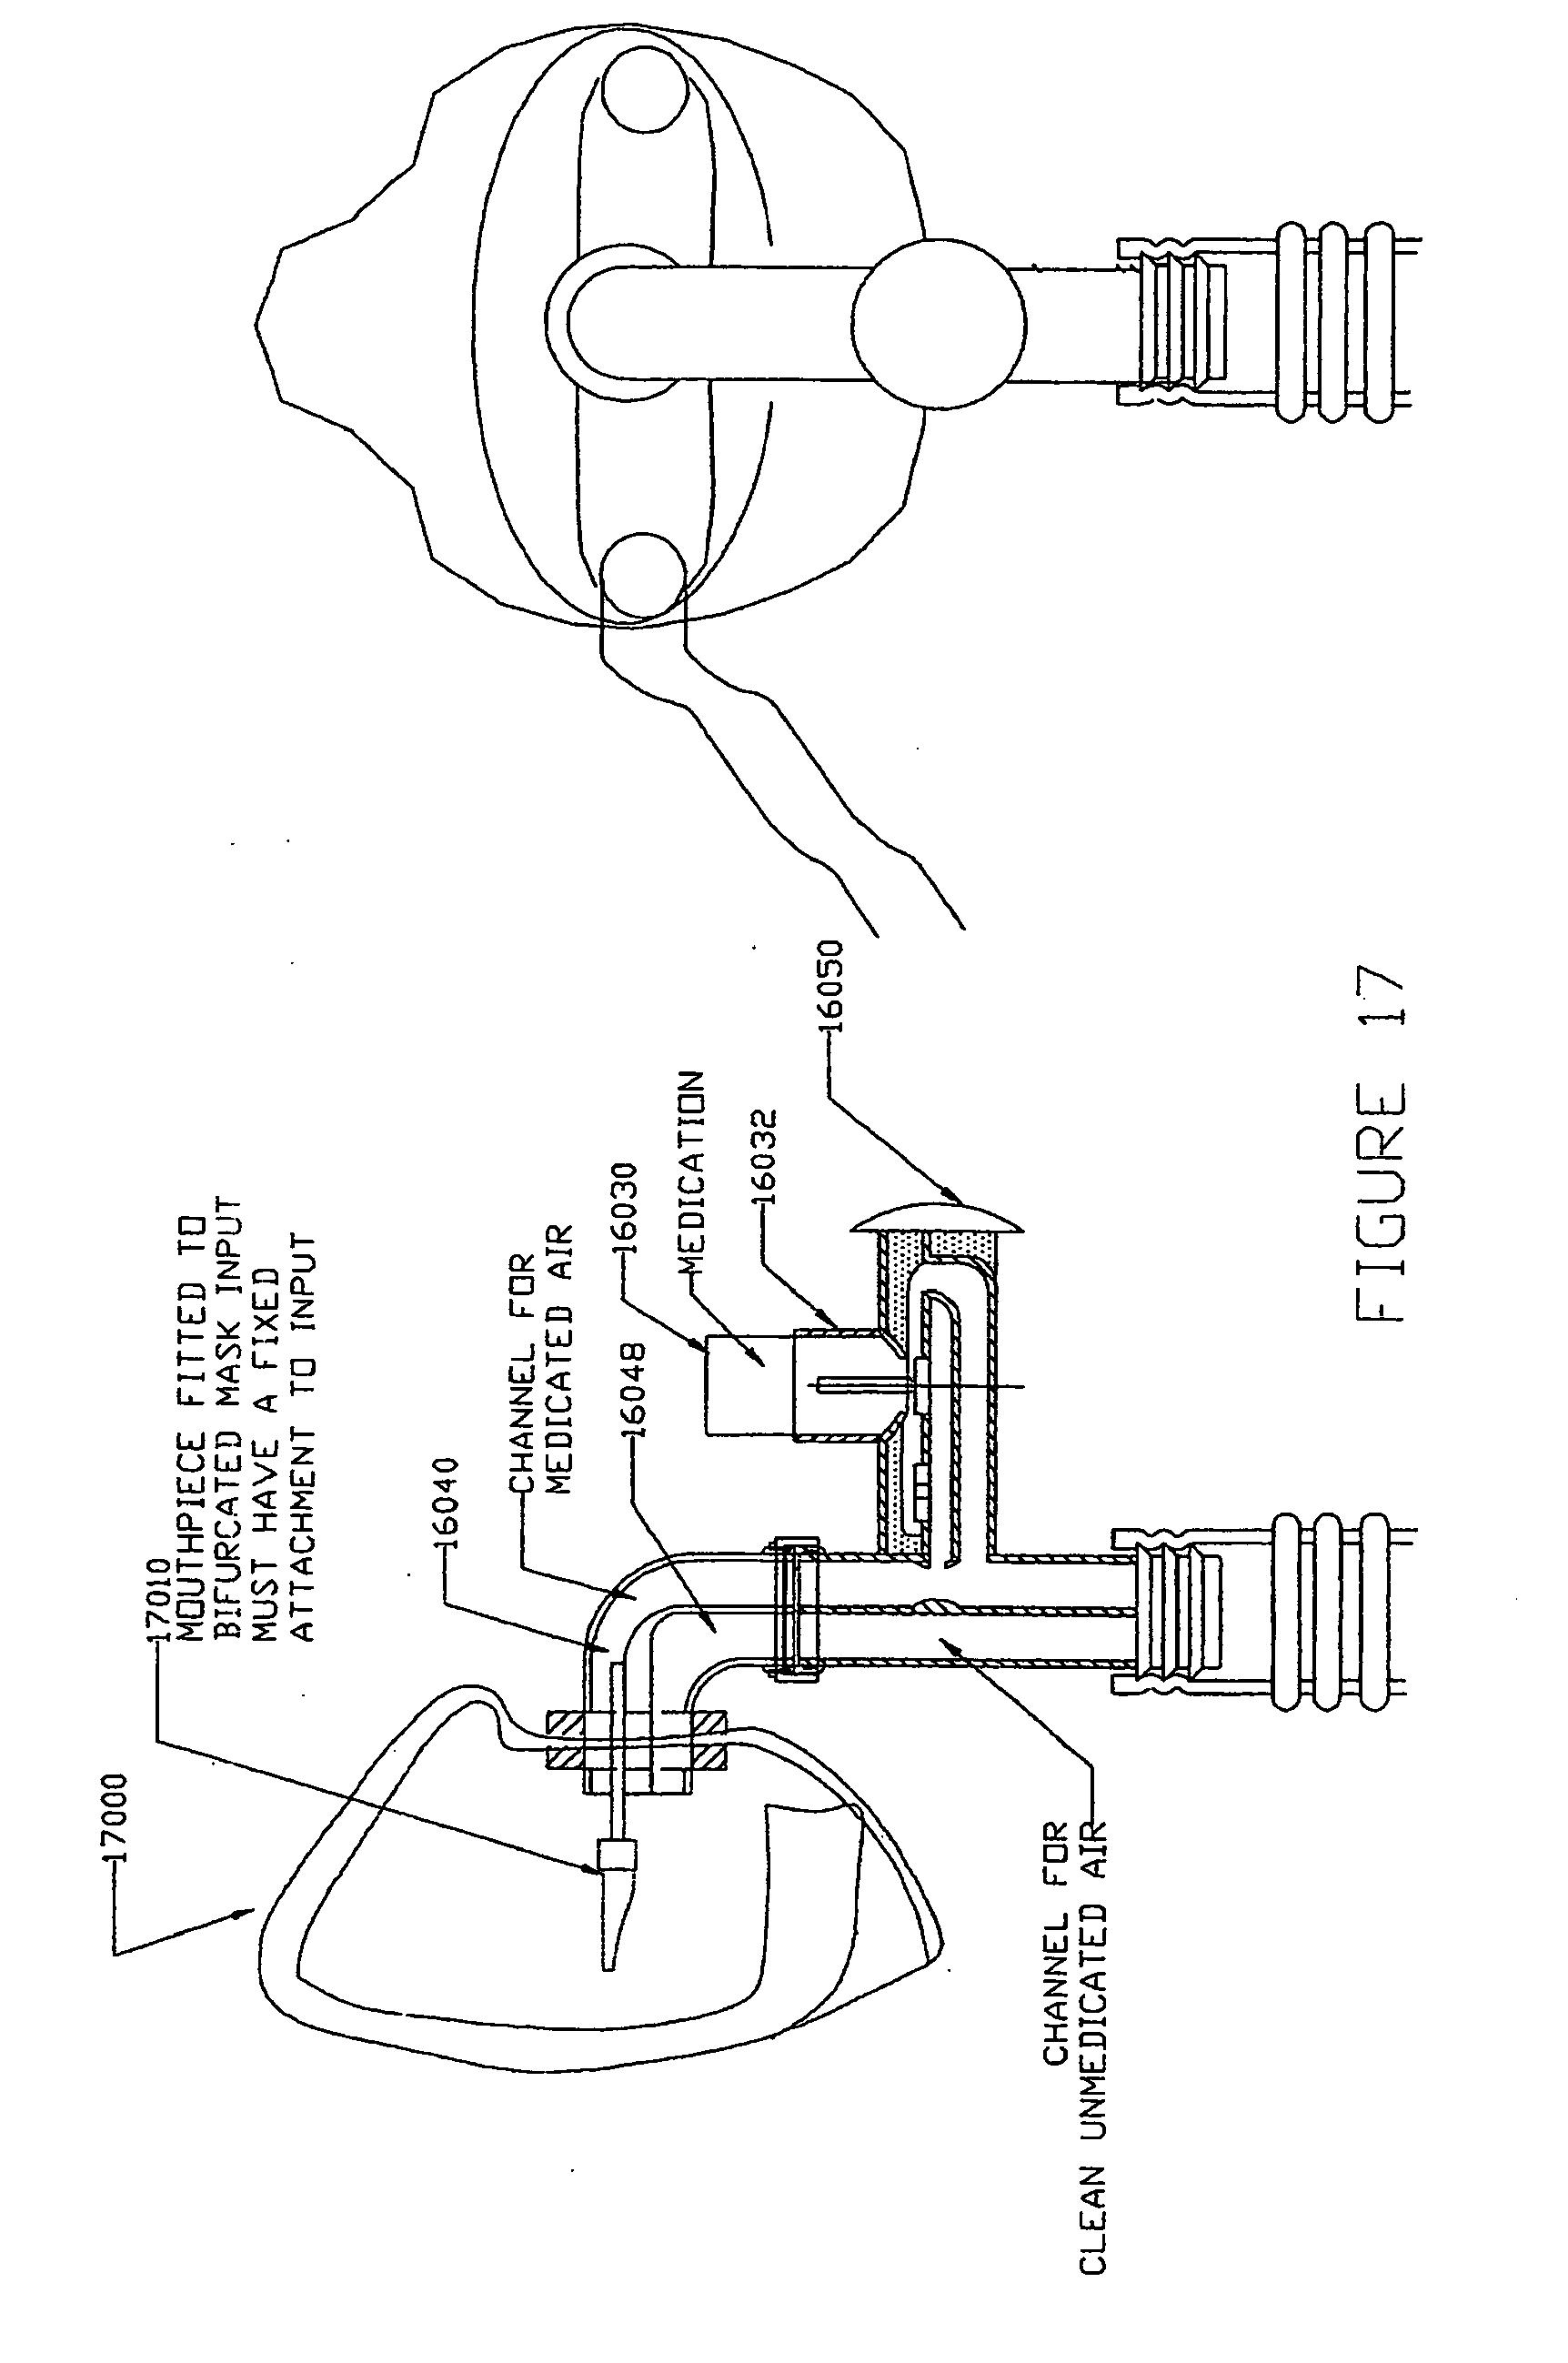 Methods and systems of delivering medication via inhalation